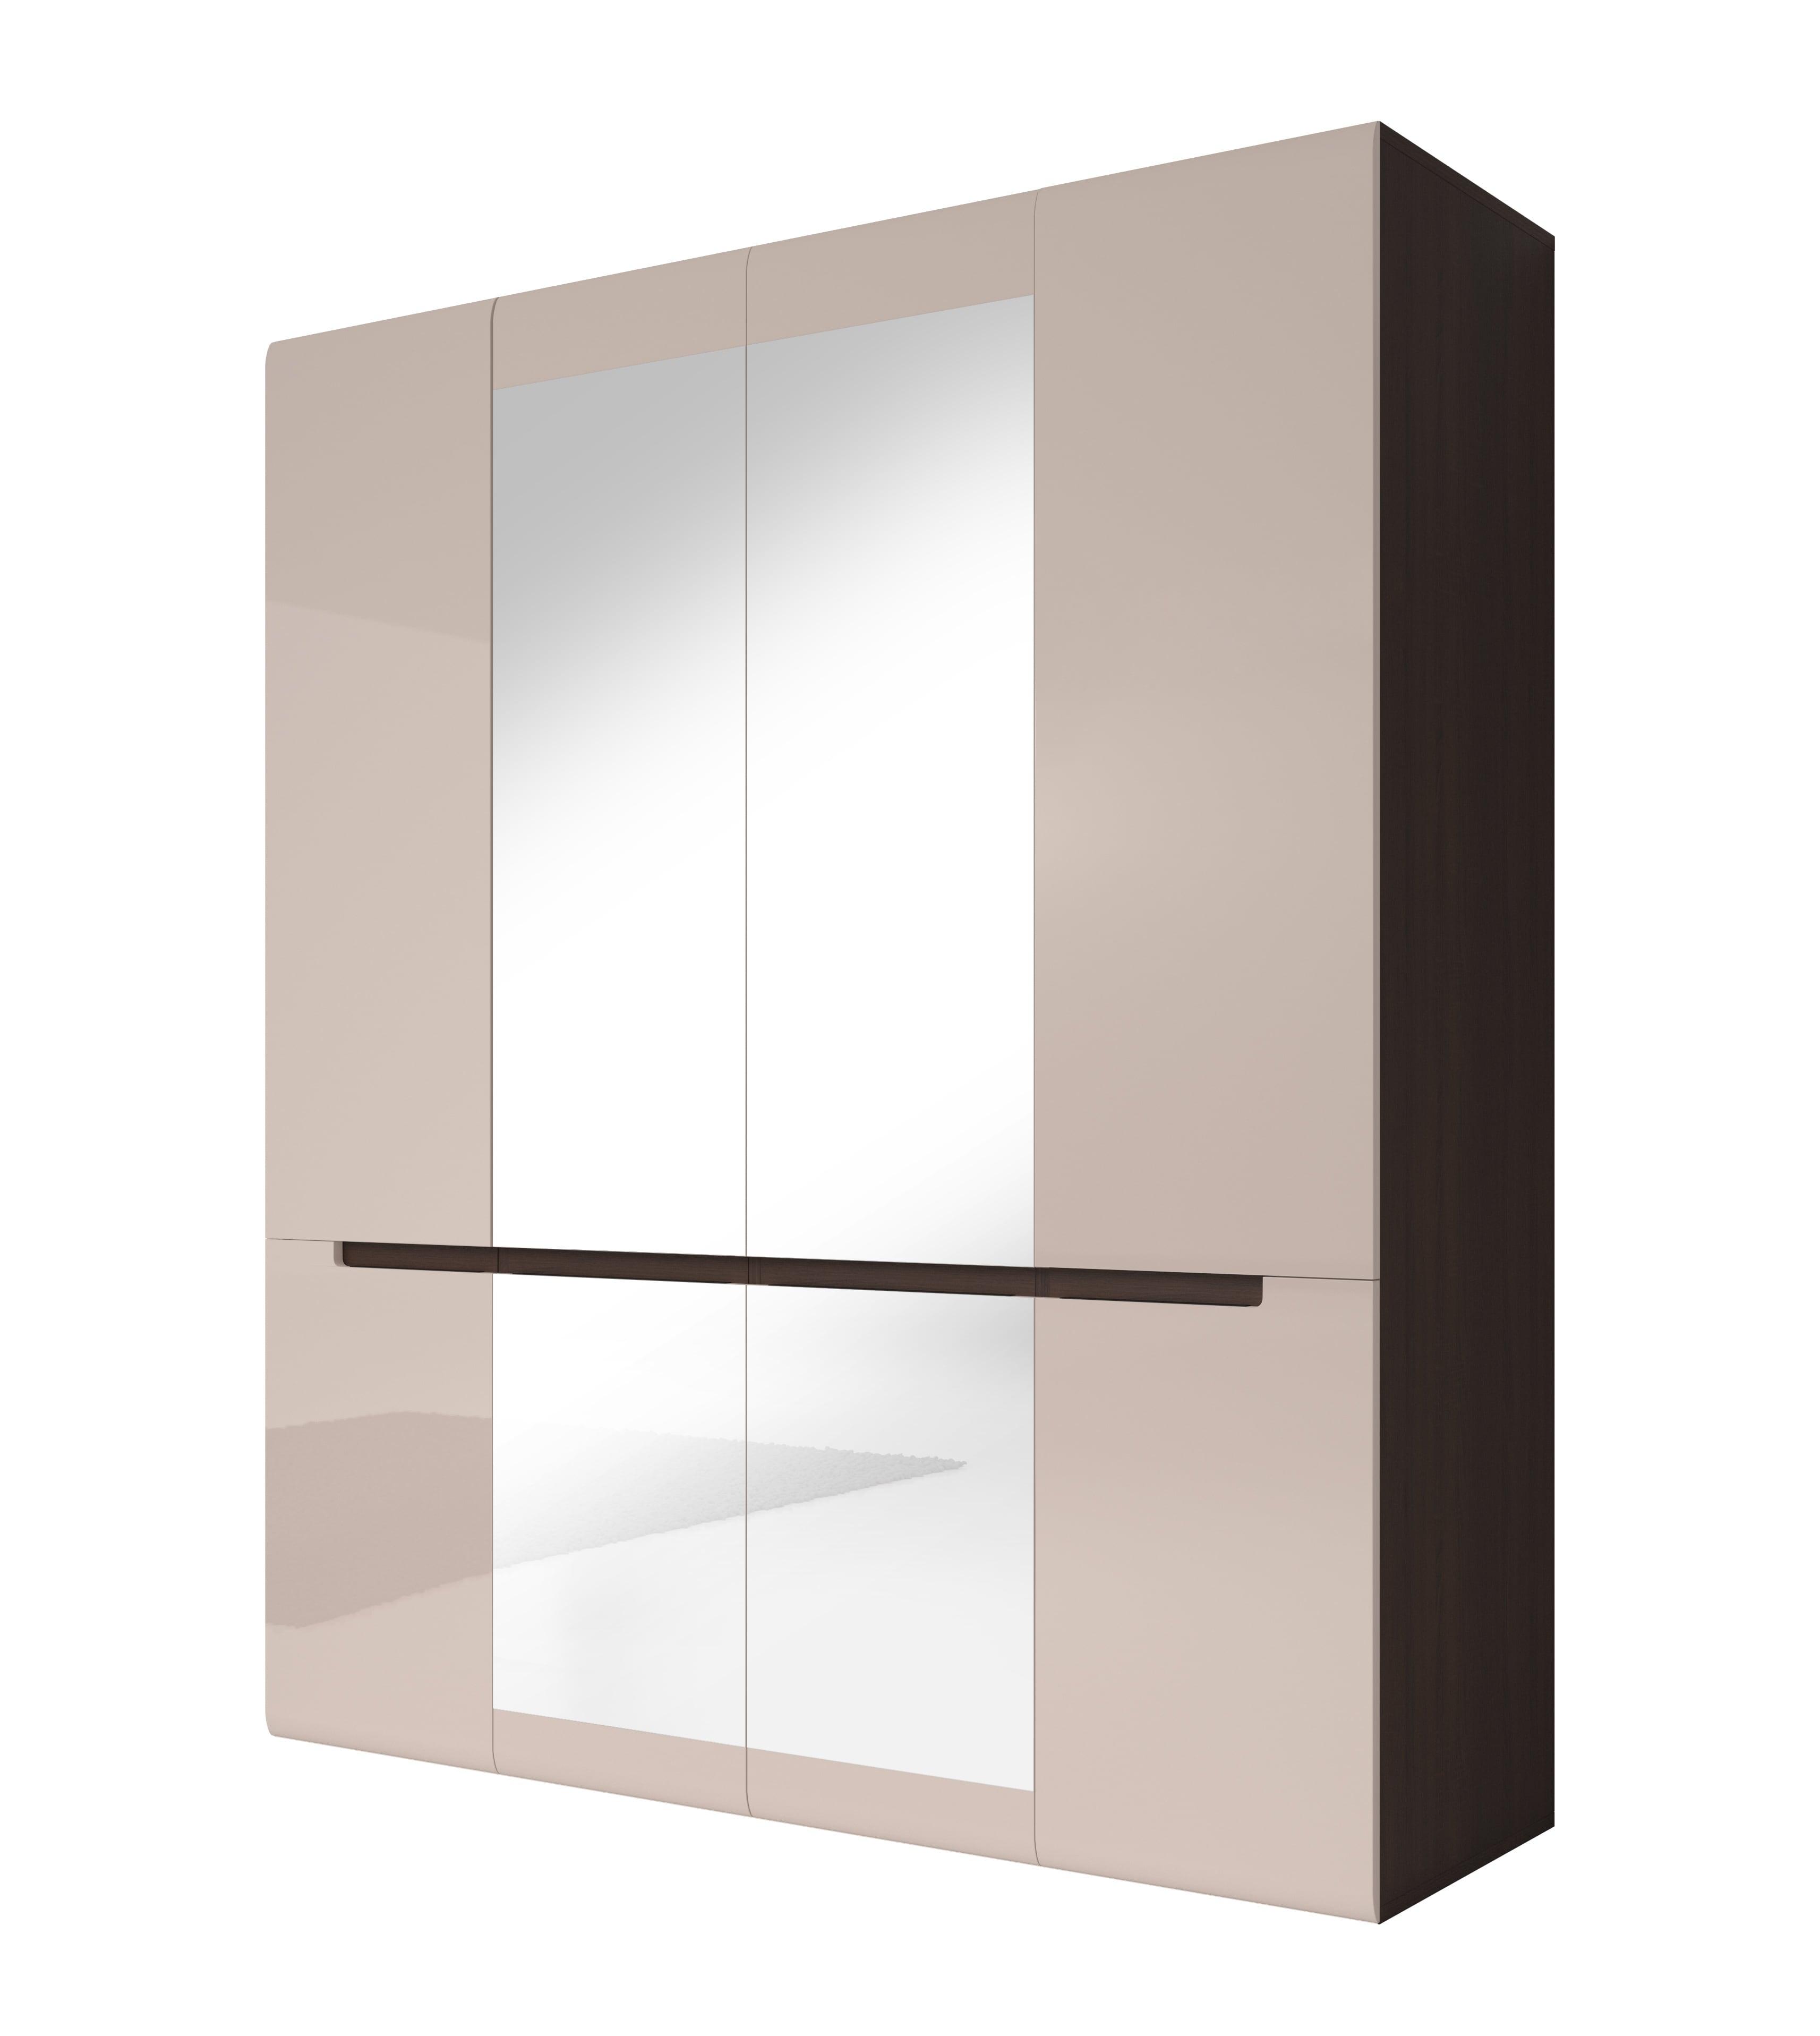 Šatní skříň - Hayle - Typ 20 (dub sonoma tmavá + šedý pískový lesk)